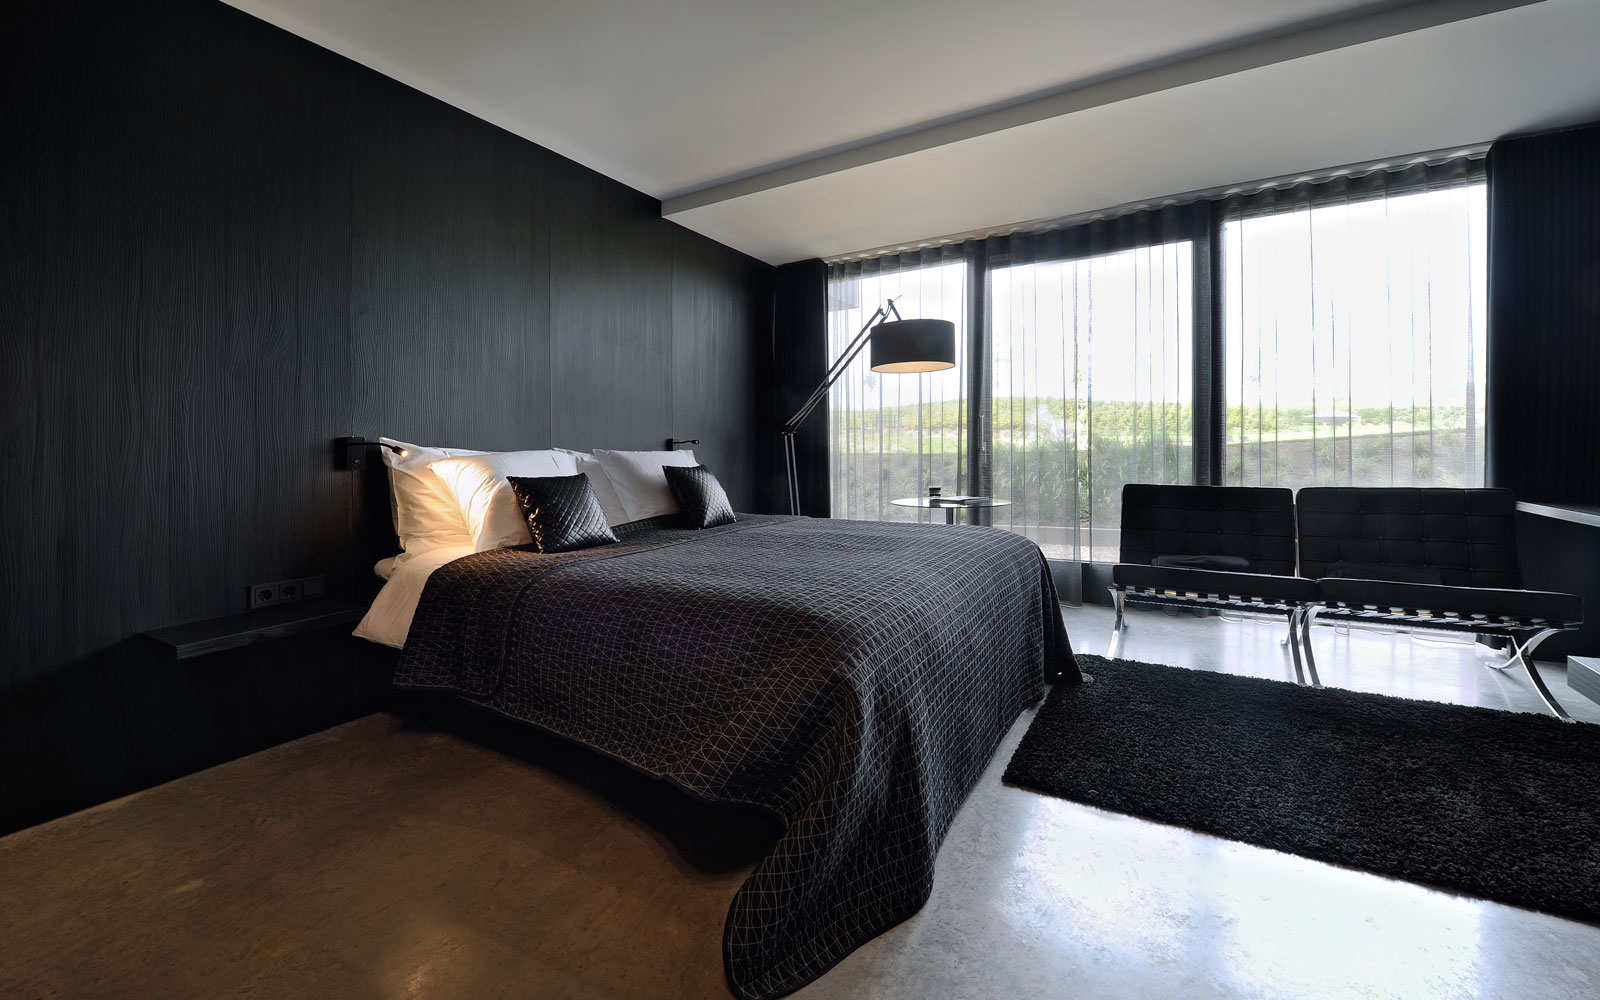 Slaapkamer, bed, Auping, donkere kleuren, zwart, grote ramen, La Marquise, Hertroijs Architekten